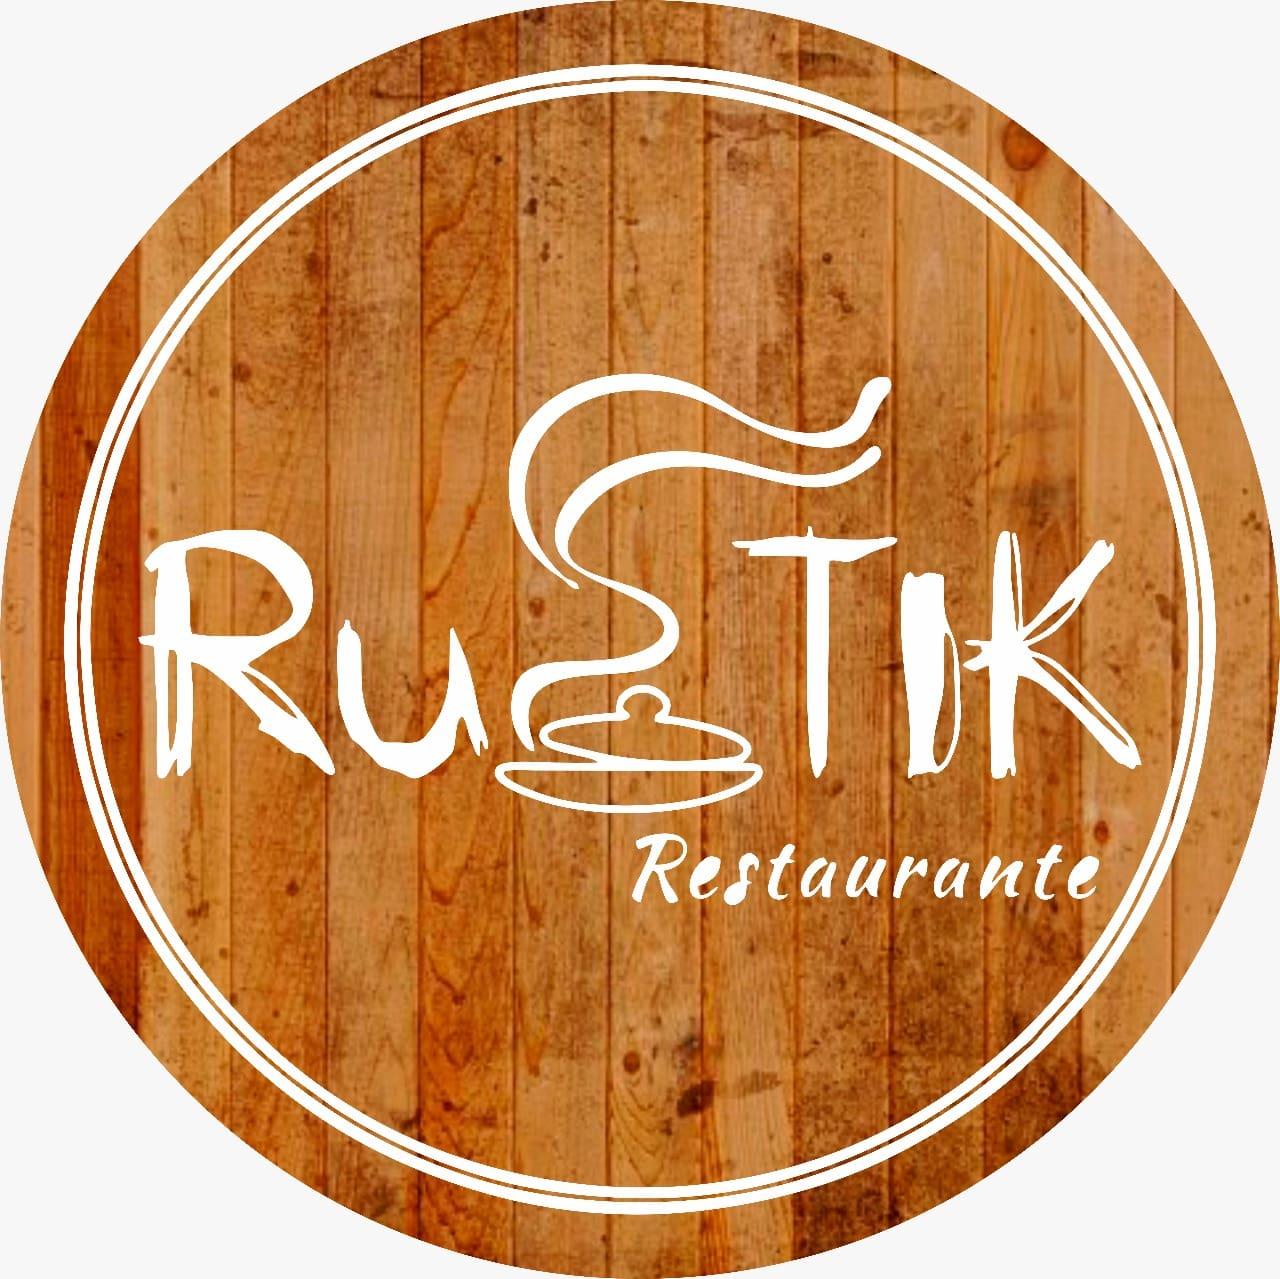 Rustik Restaurante